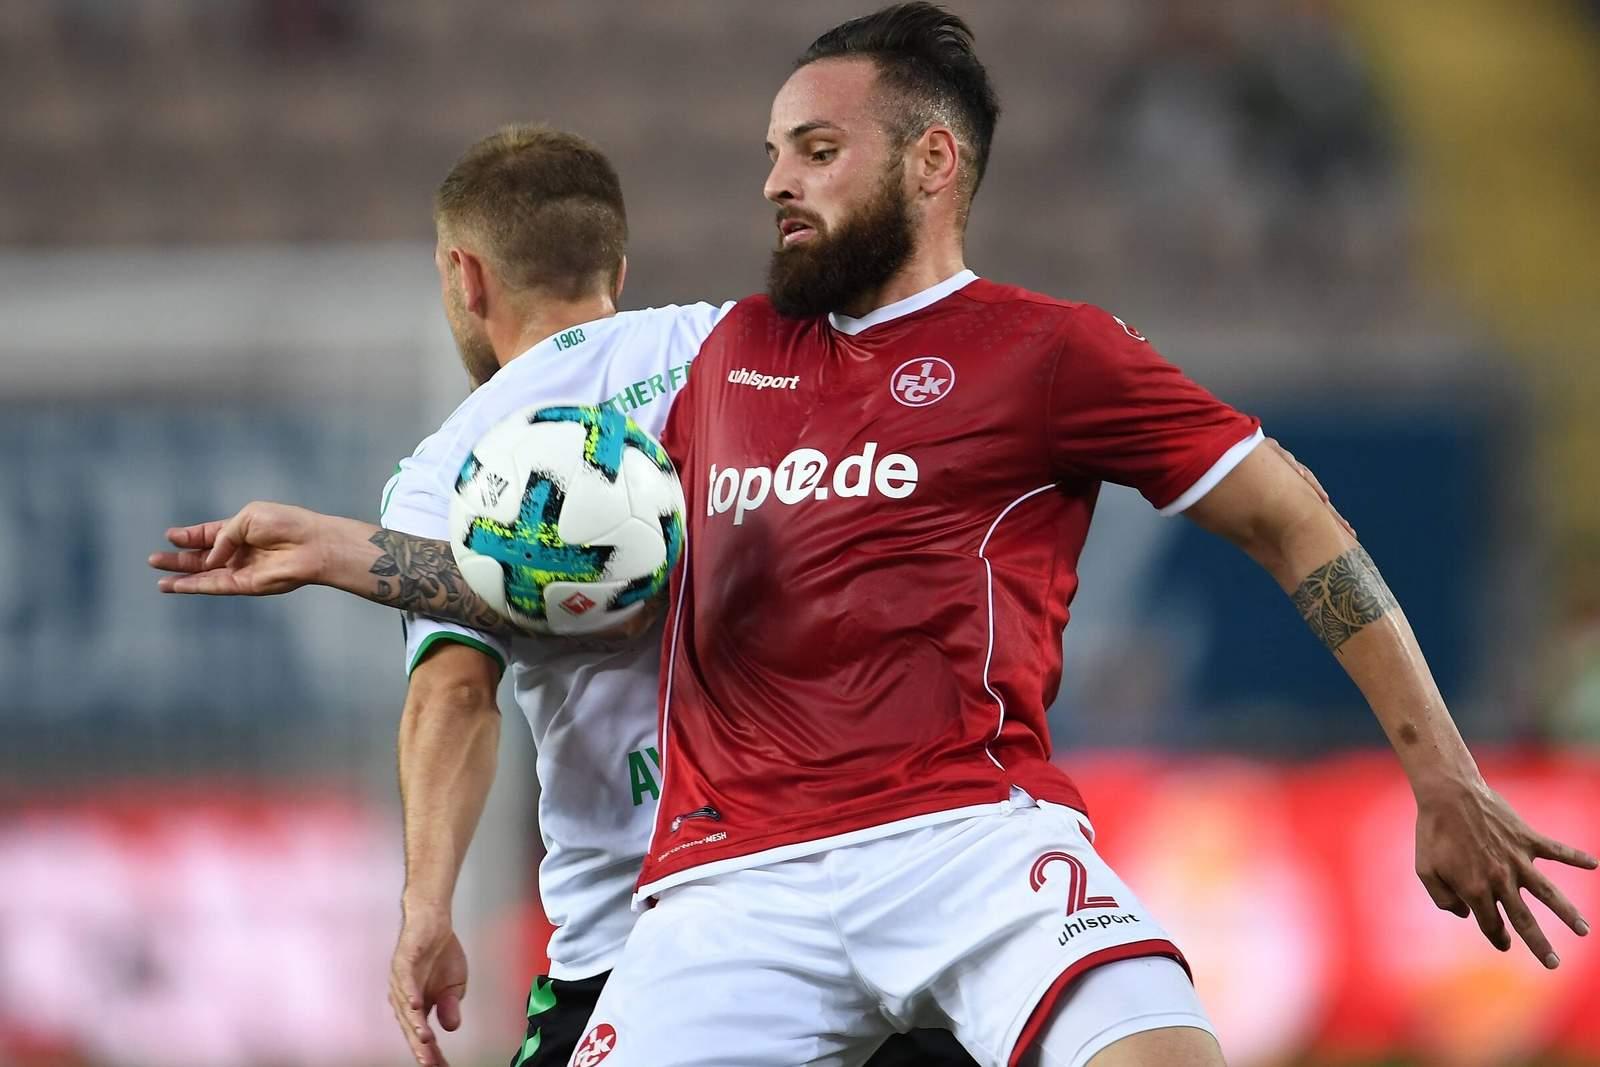 Giuliano Modica vom 1.FC Kaiserslautern im Zweikampf mit Aycicek